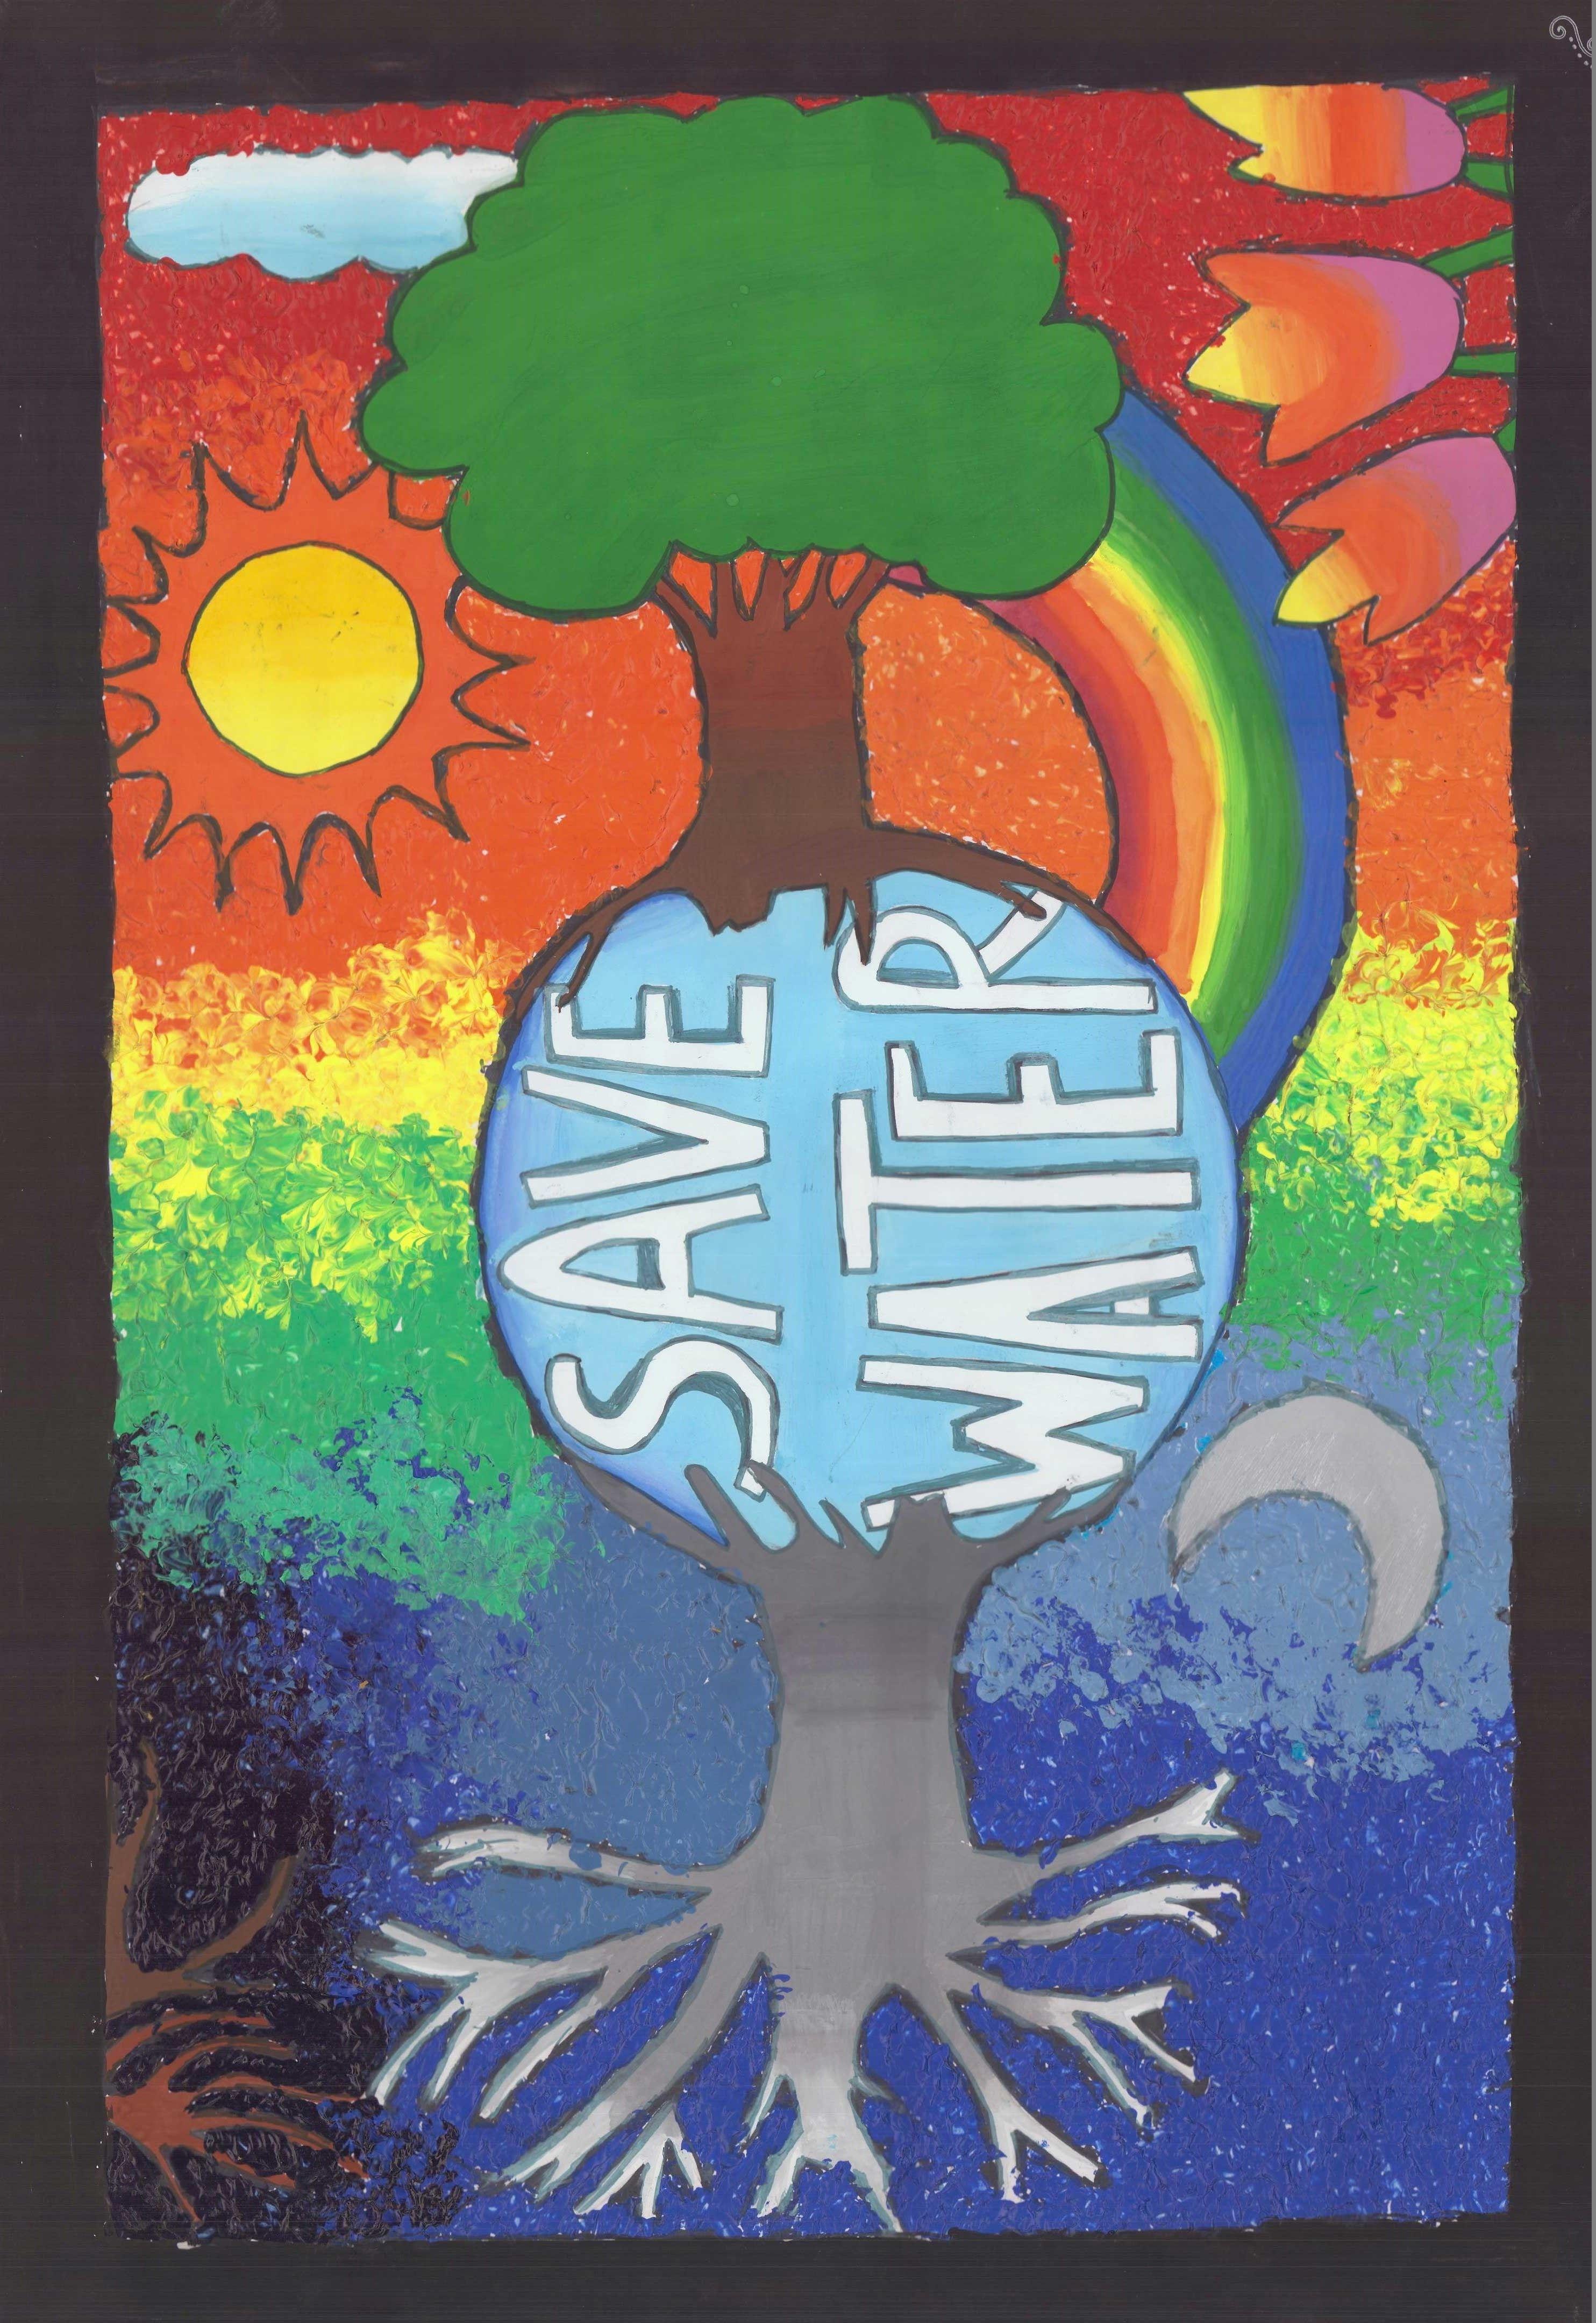 Poster On Water Conservation By Nayak Miti Bhadreshkumar Little Flower School Ahmedabad